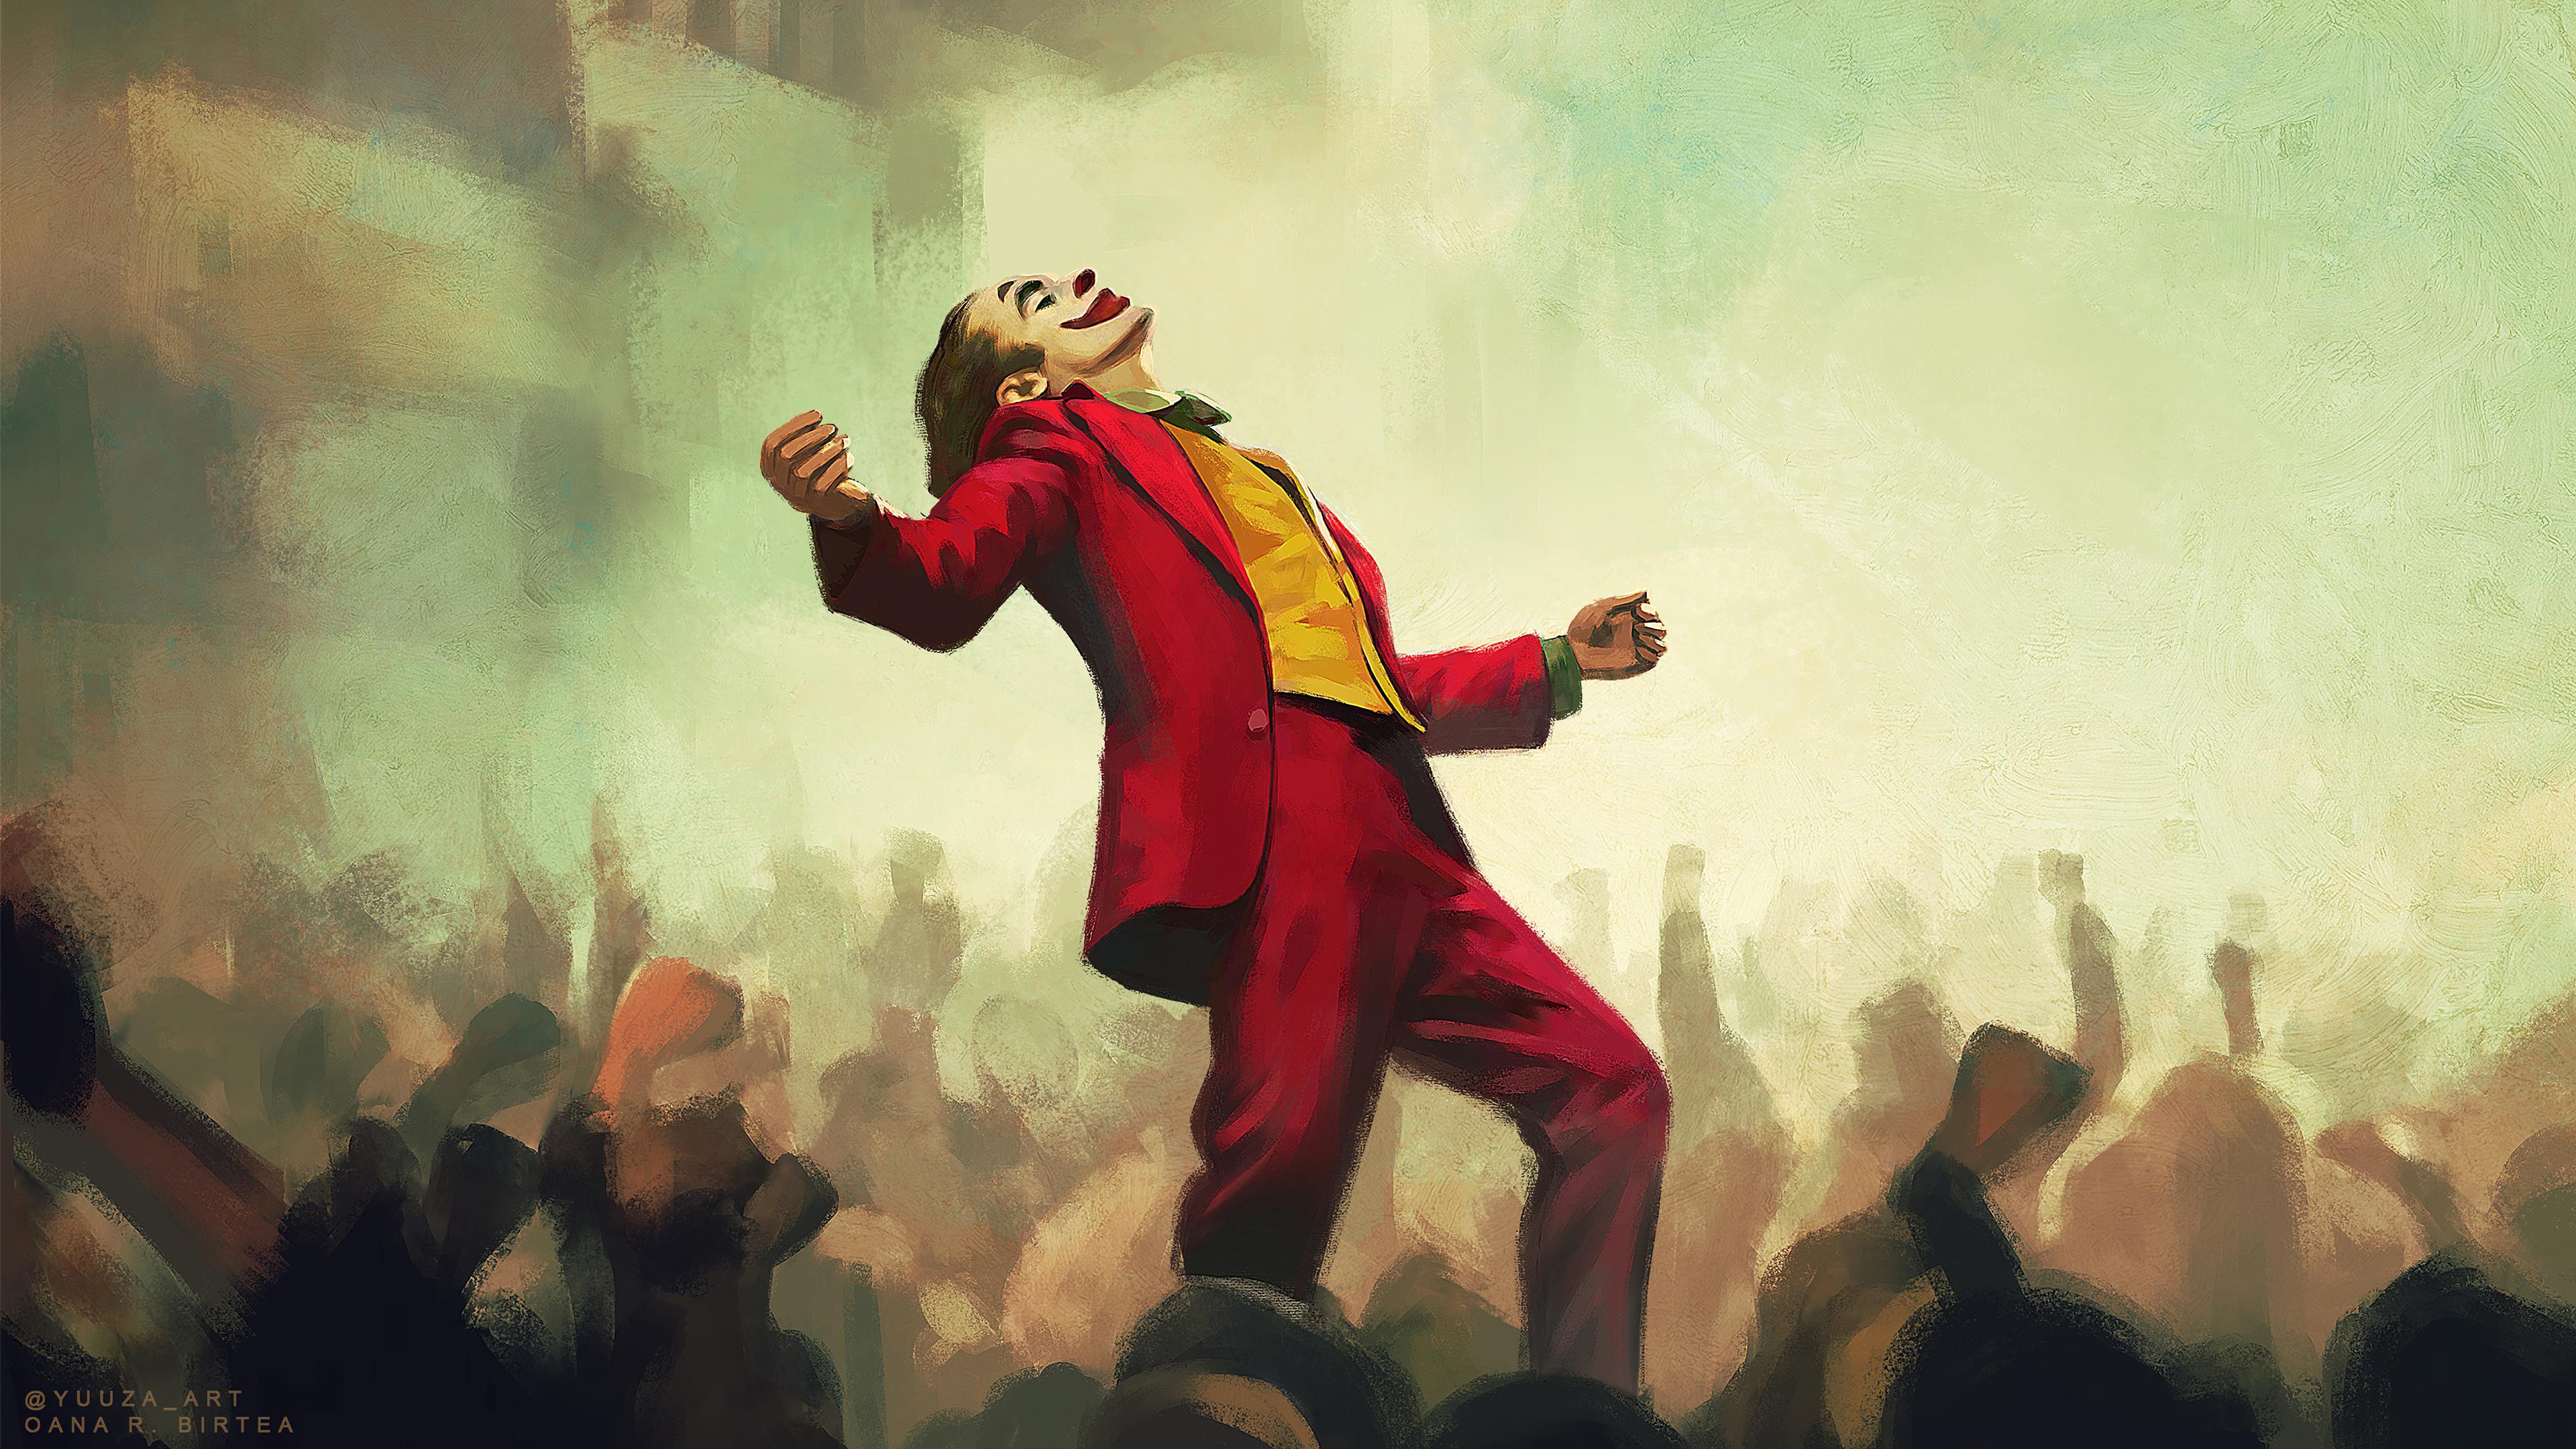 joaquin phoenix joker art 4k 1576097983 - Joaquin Phoenix Joker Art 4k - joker phone wallpaper hd 4k, joker hd wallpaper 4k, joker art wallpaper hd 4k, Joaquin Phoenix Joker wallpaper 4k hd, 4k wallpaper joker